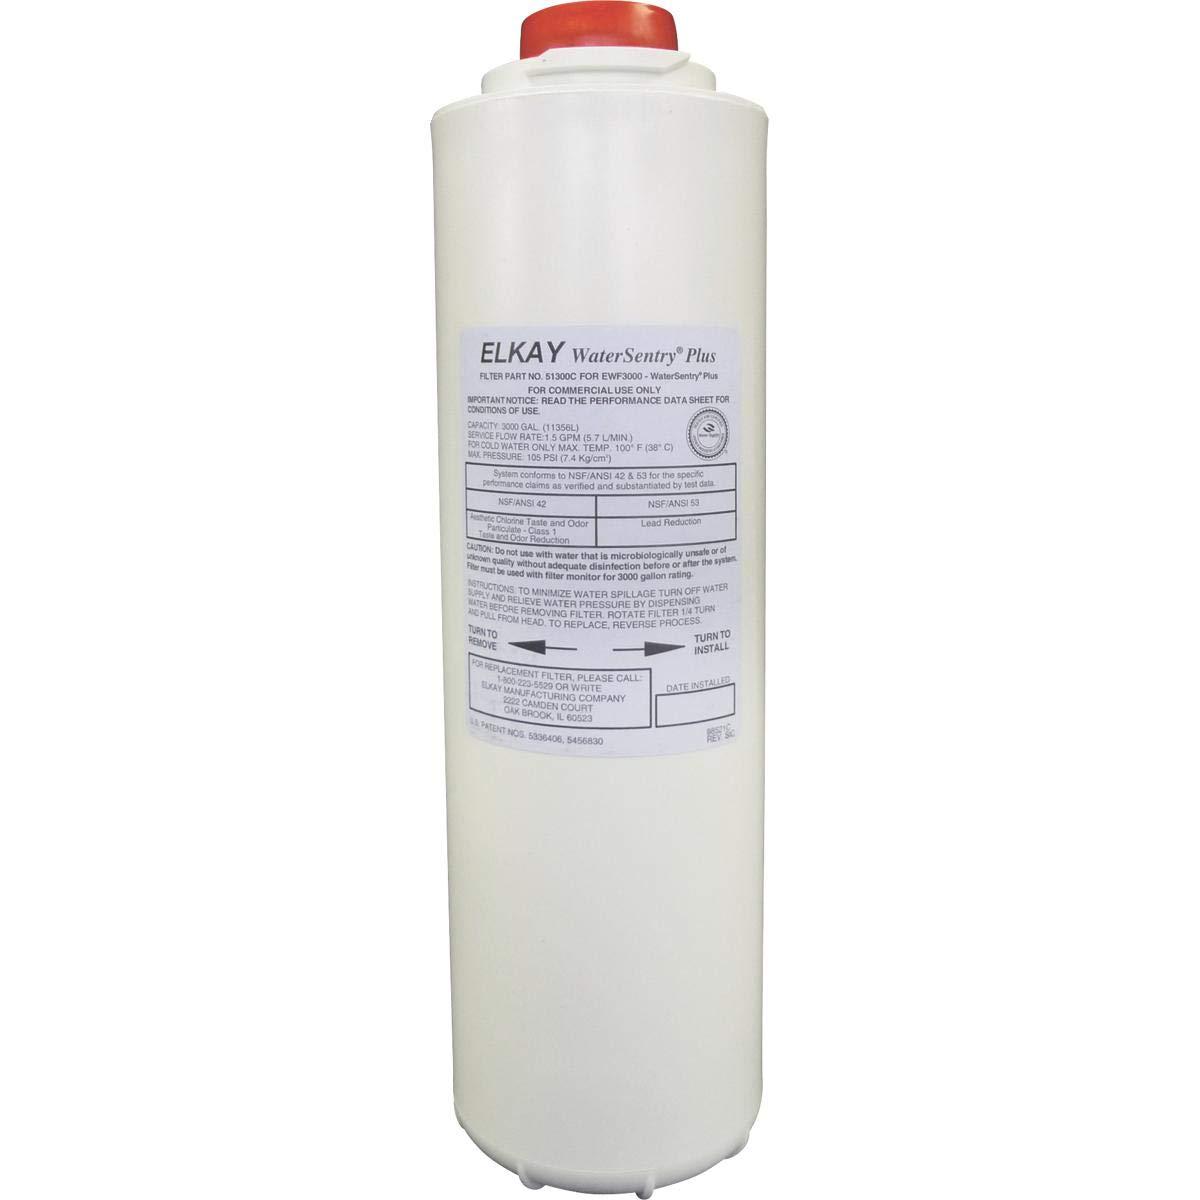 Elkay 51300C_3PK WaterSentry Plus Replacement Filter (Bottle Fillers), 3-Pack